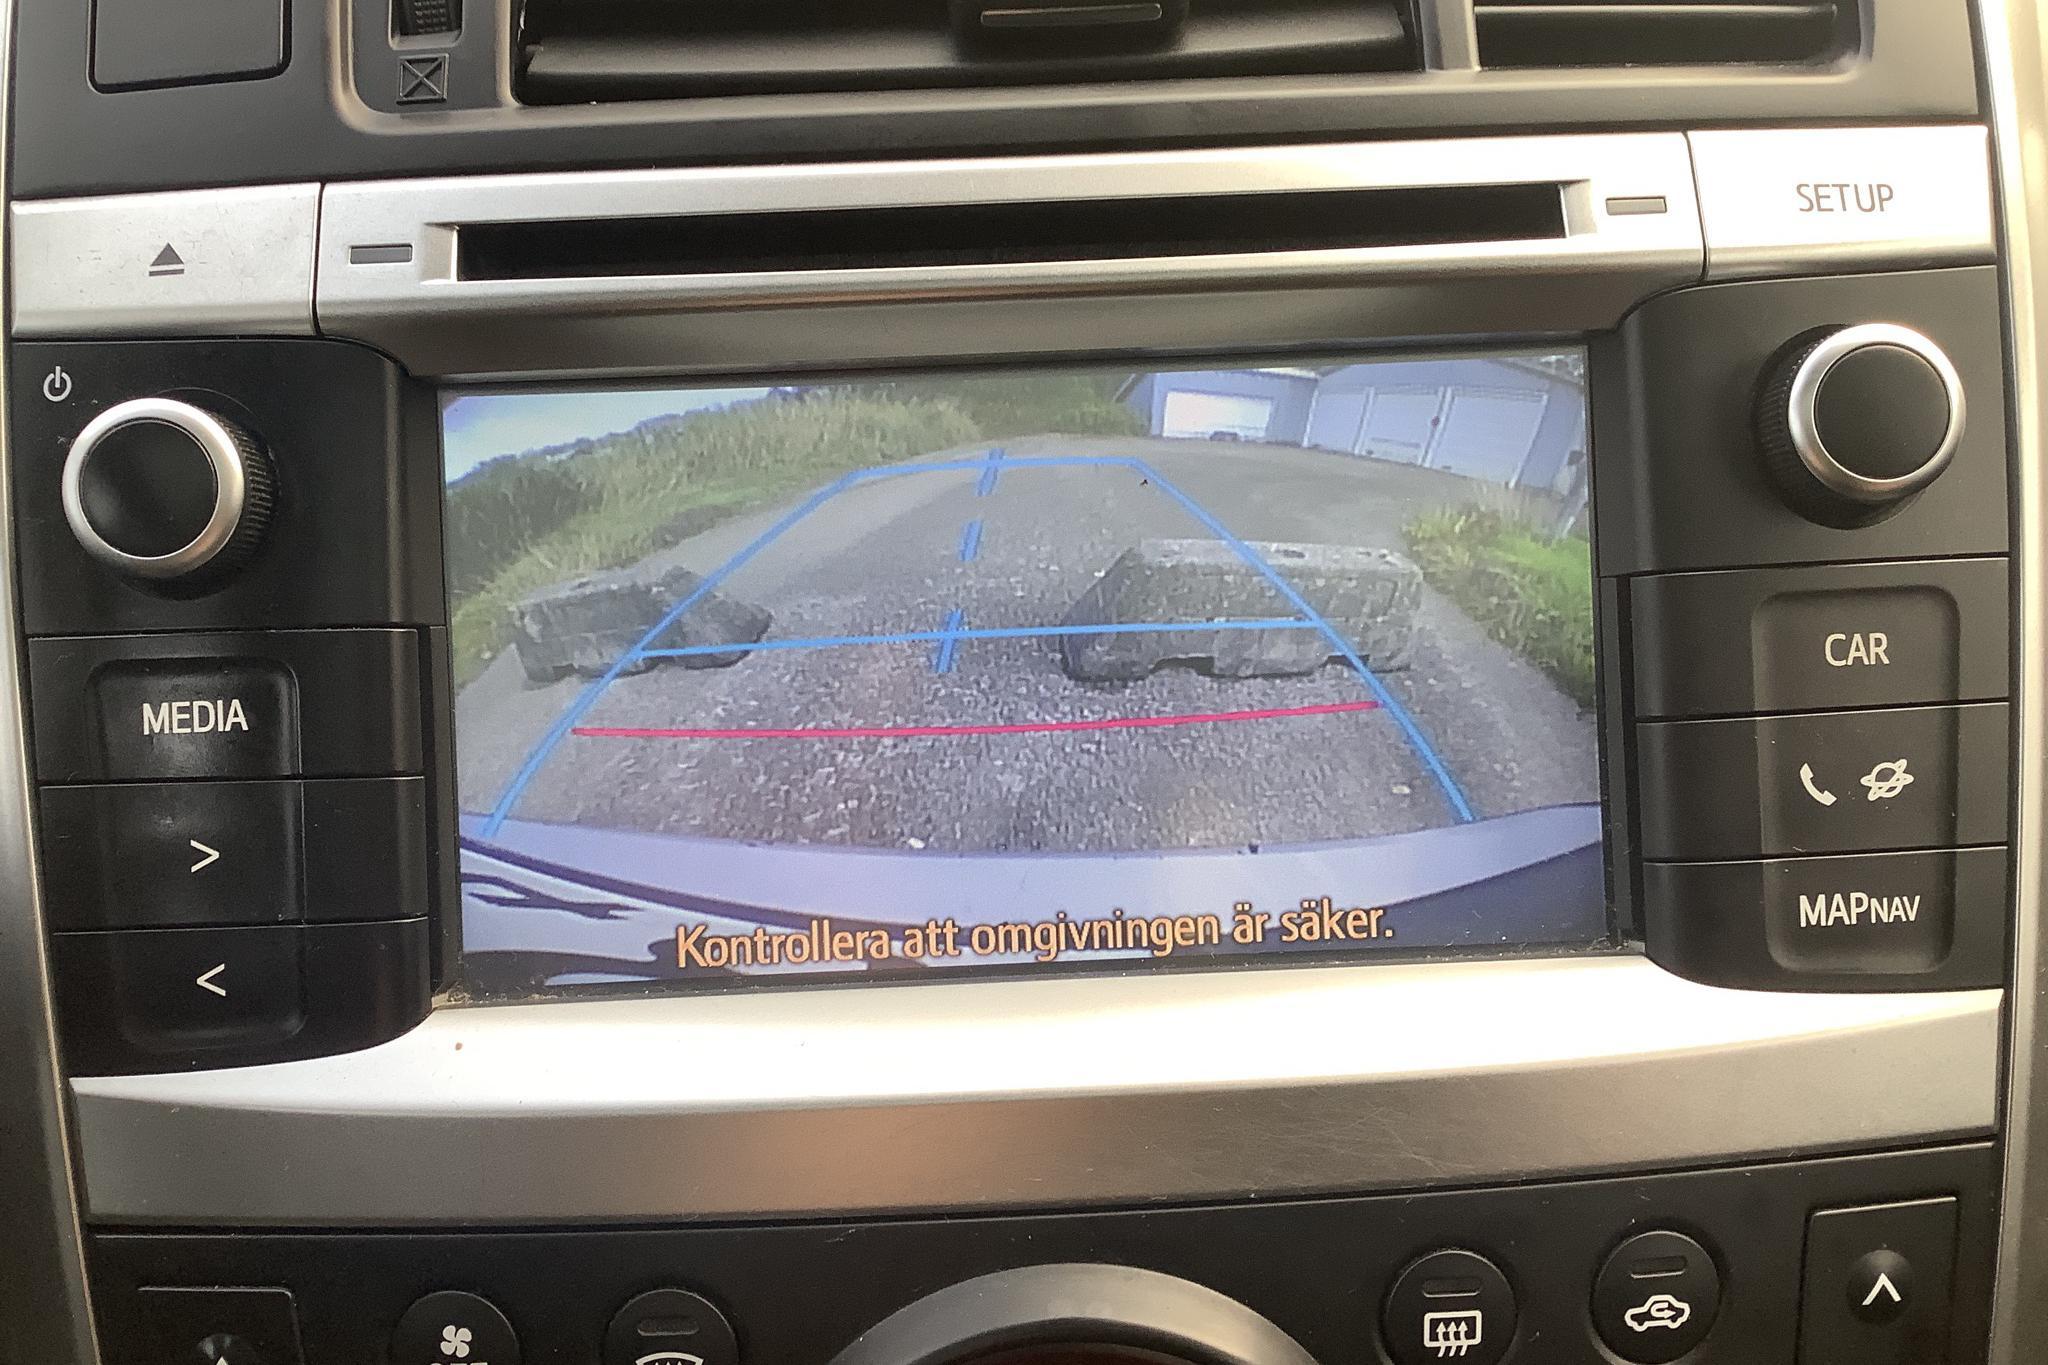 Toyota Verso 1.6 D-4D DPF (112hk) - 105 380 km - Manual - brown - 2014